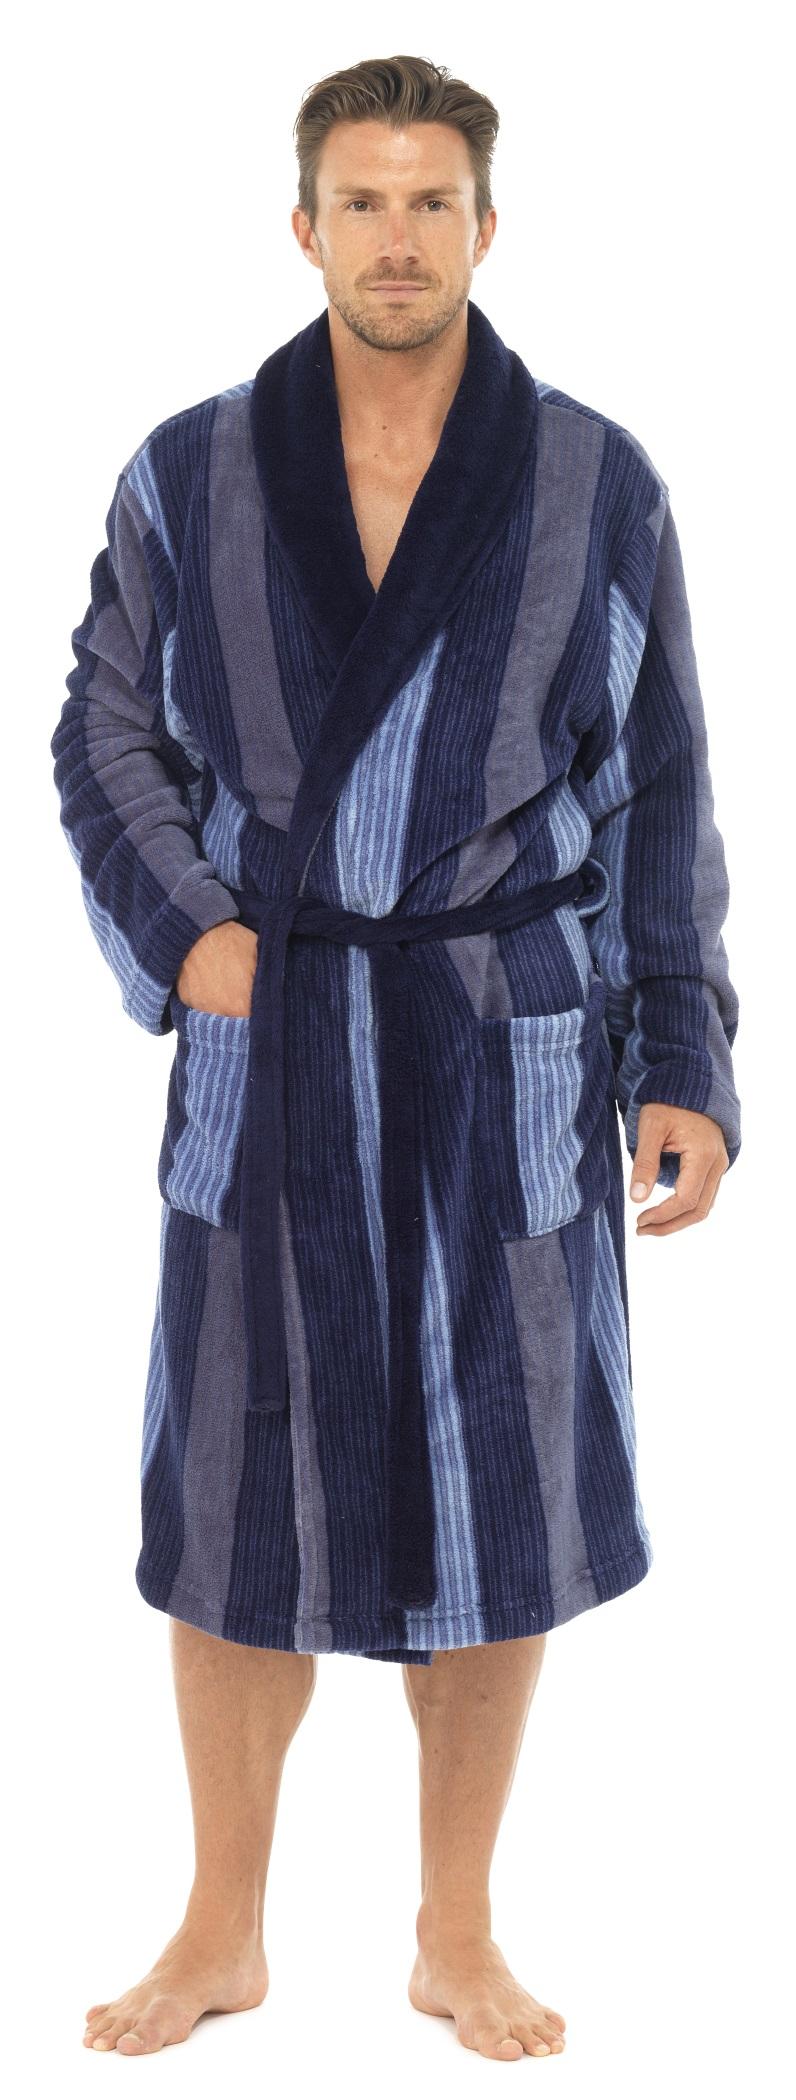 Mens Luxury Full Length Velour Fleece Robe Dressing Gown Boys Gents ... 4ef54a357